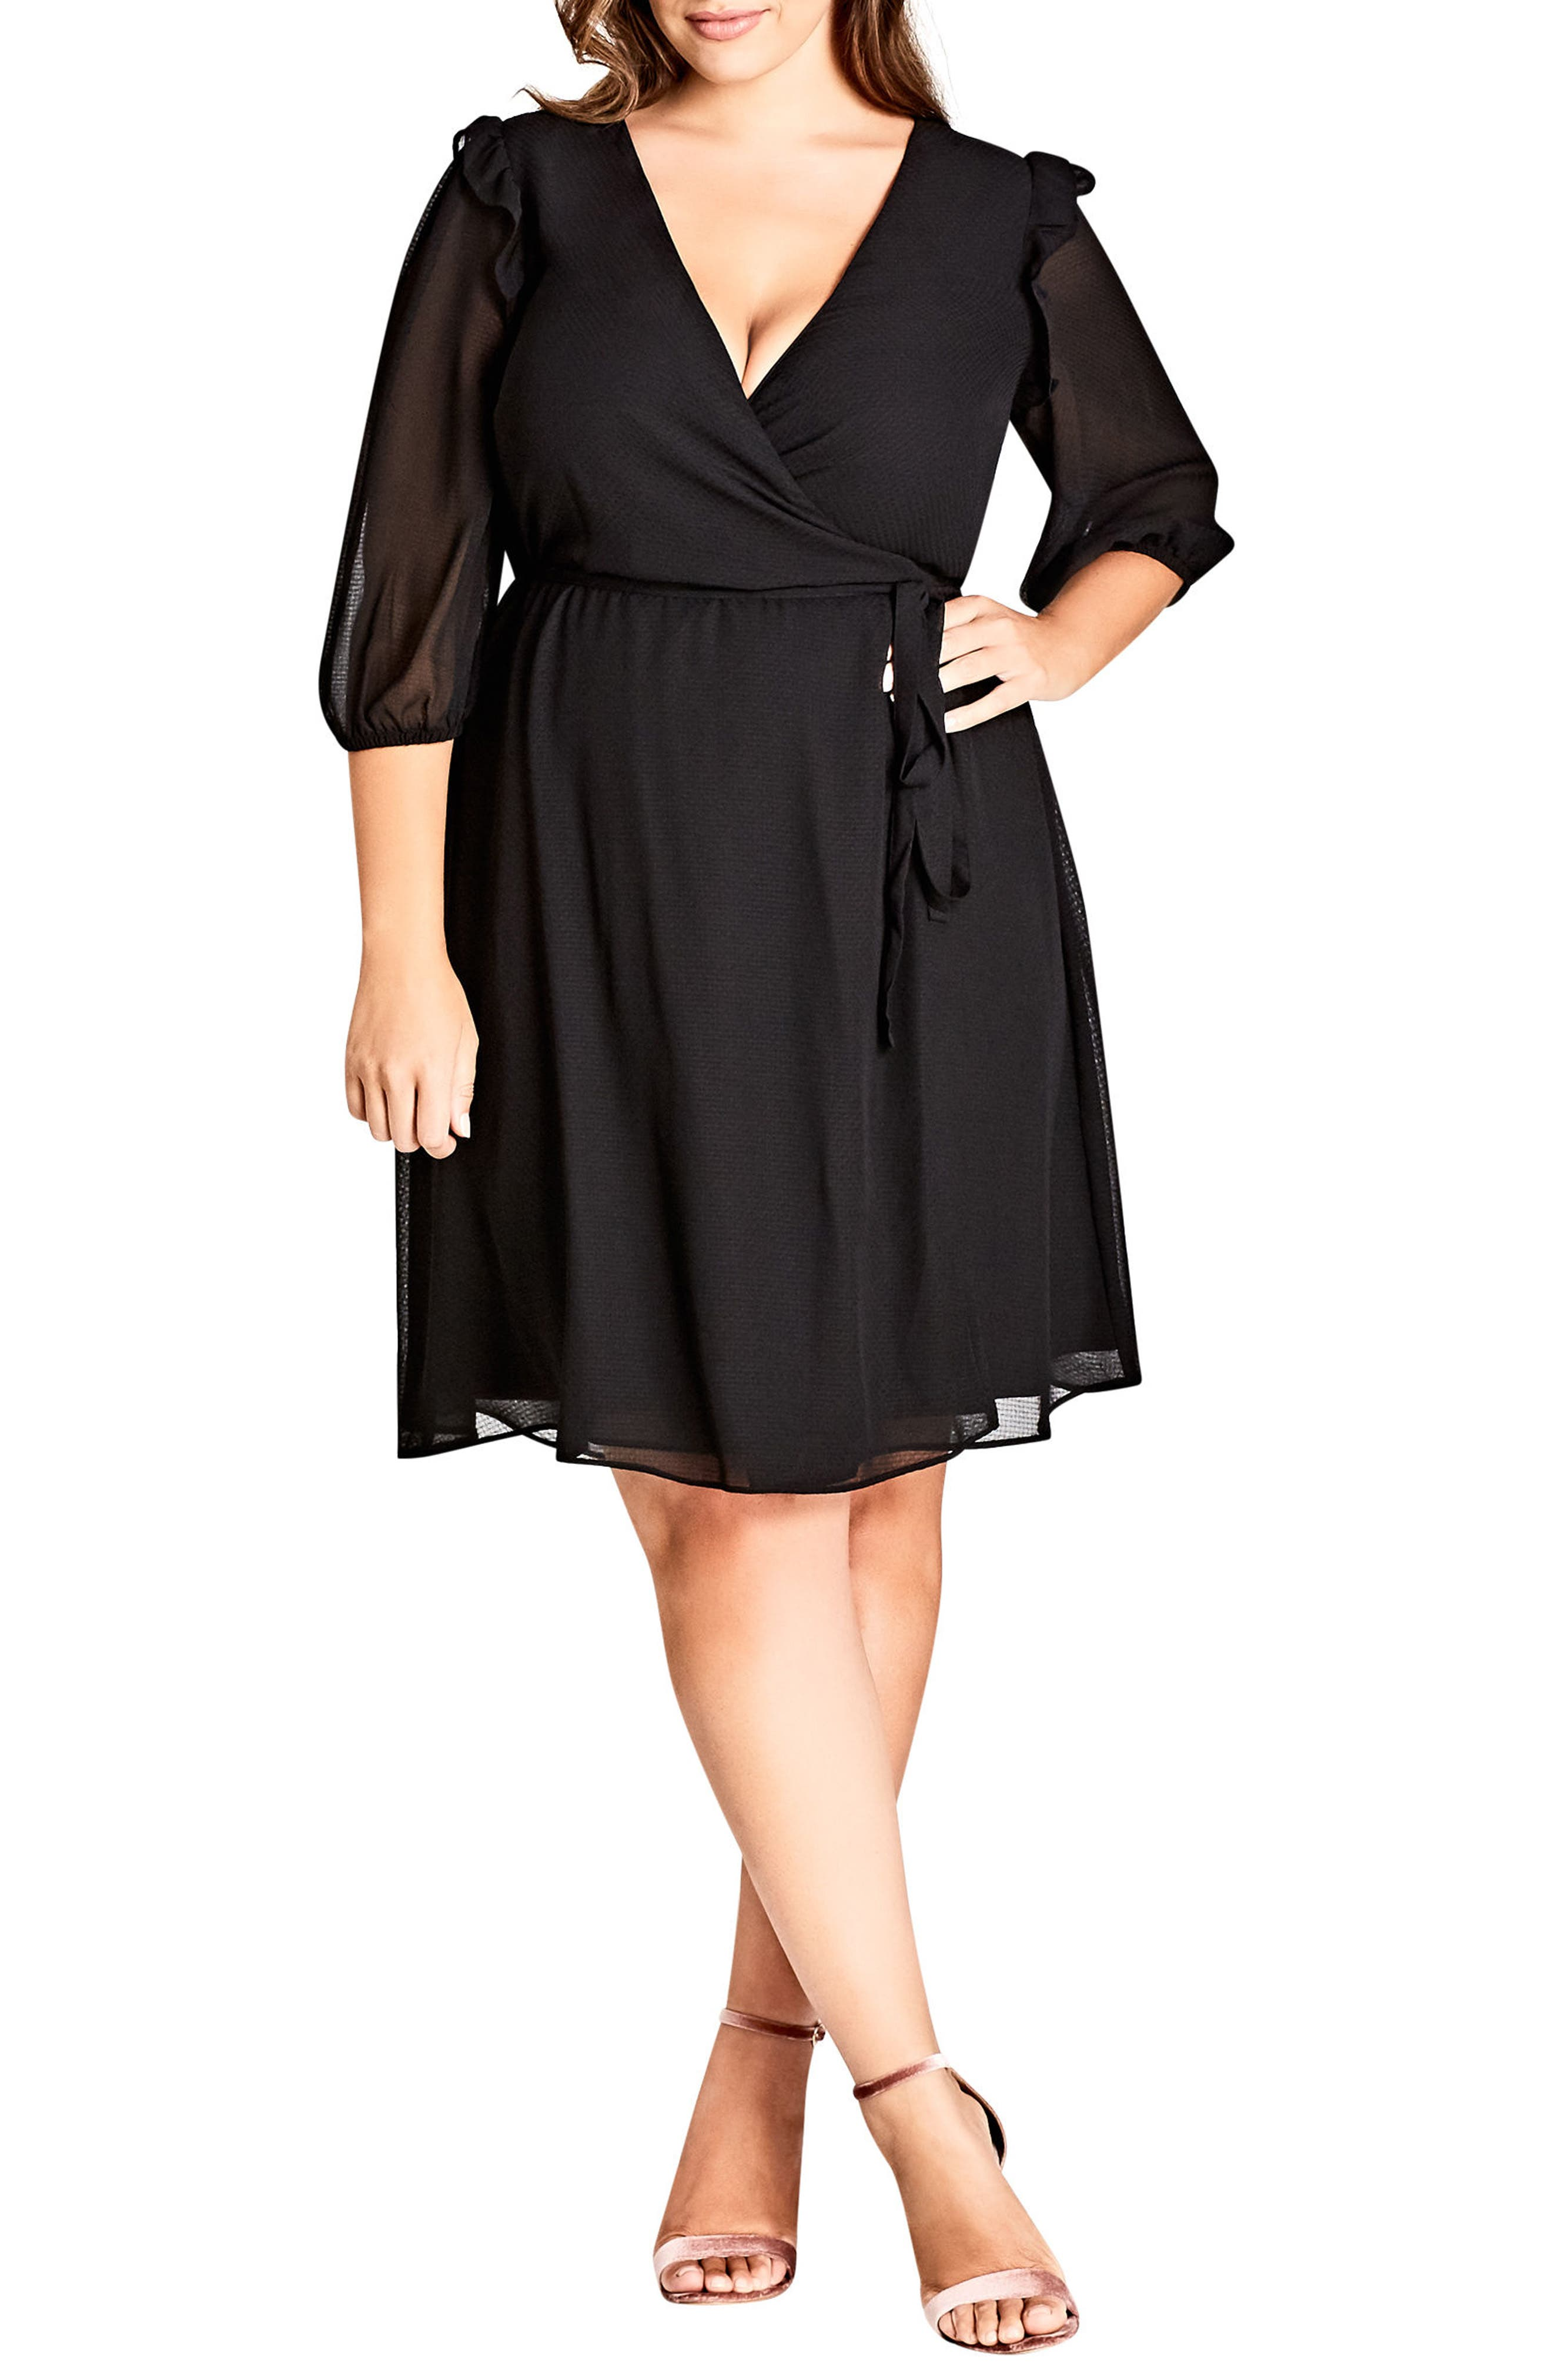 Simply So Wrap Dress,                         Main,                         color, Black